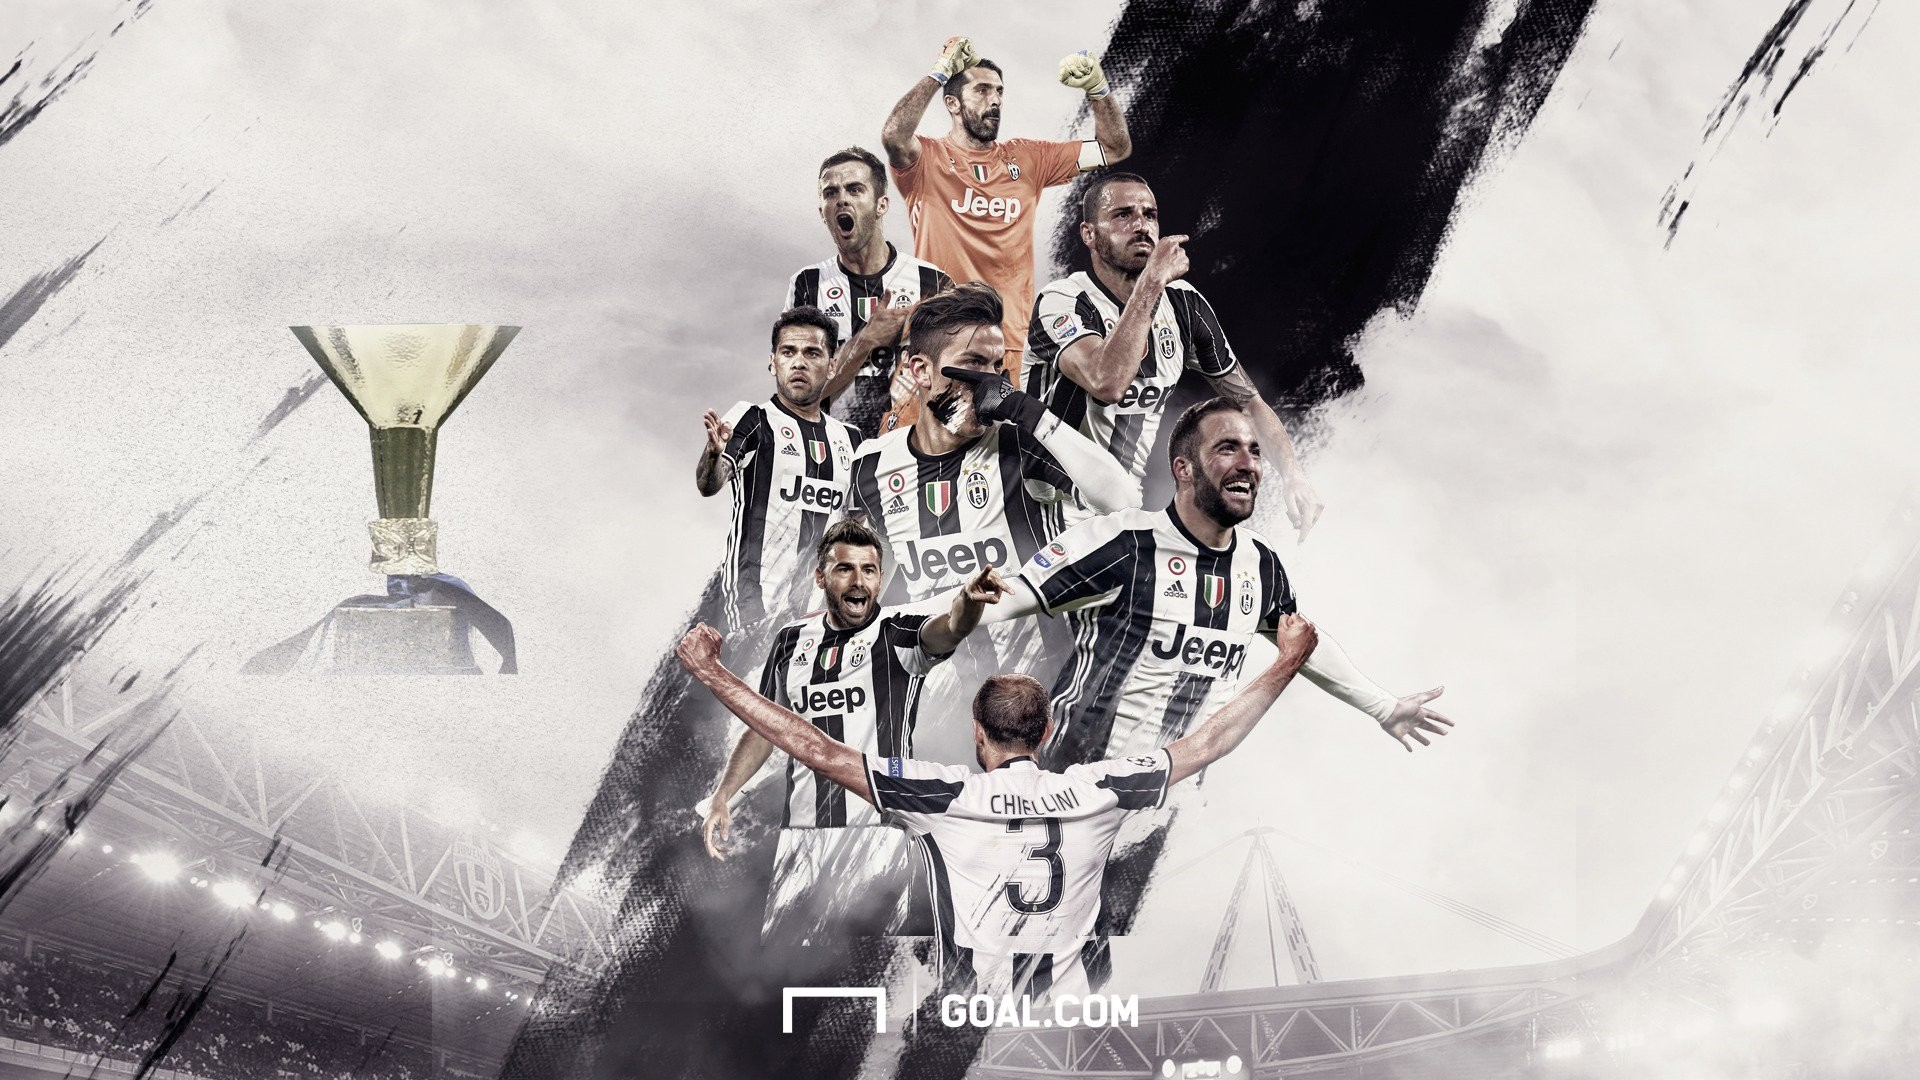 Juventus Full HD Wallpaper